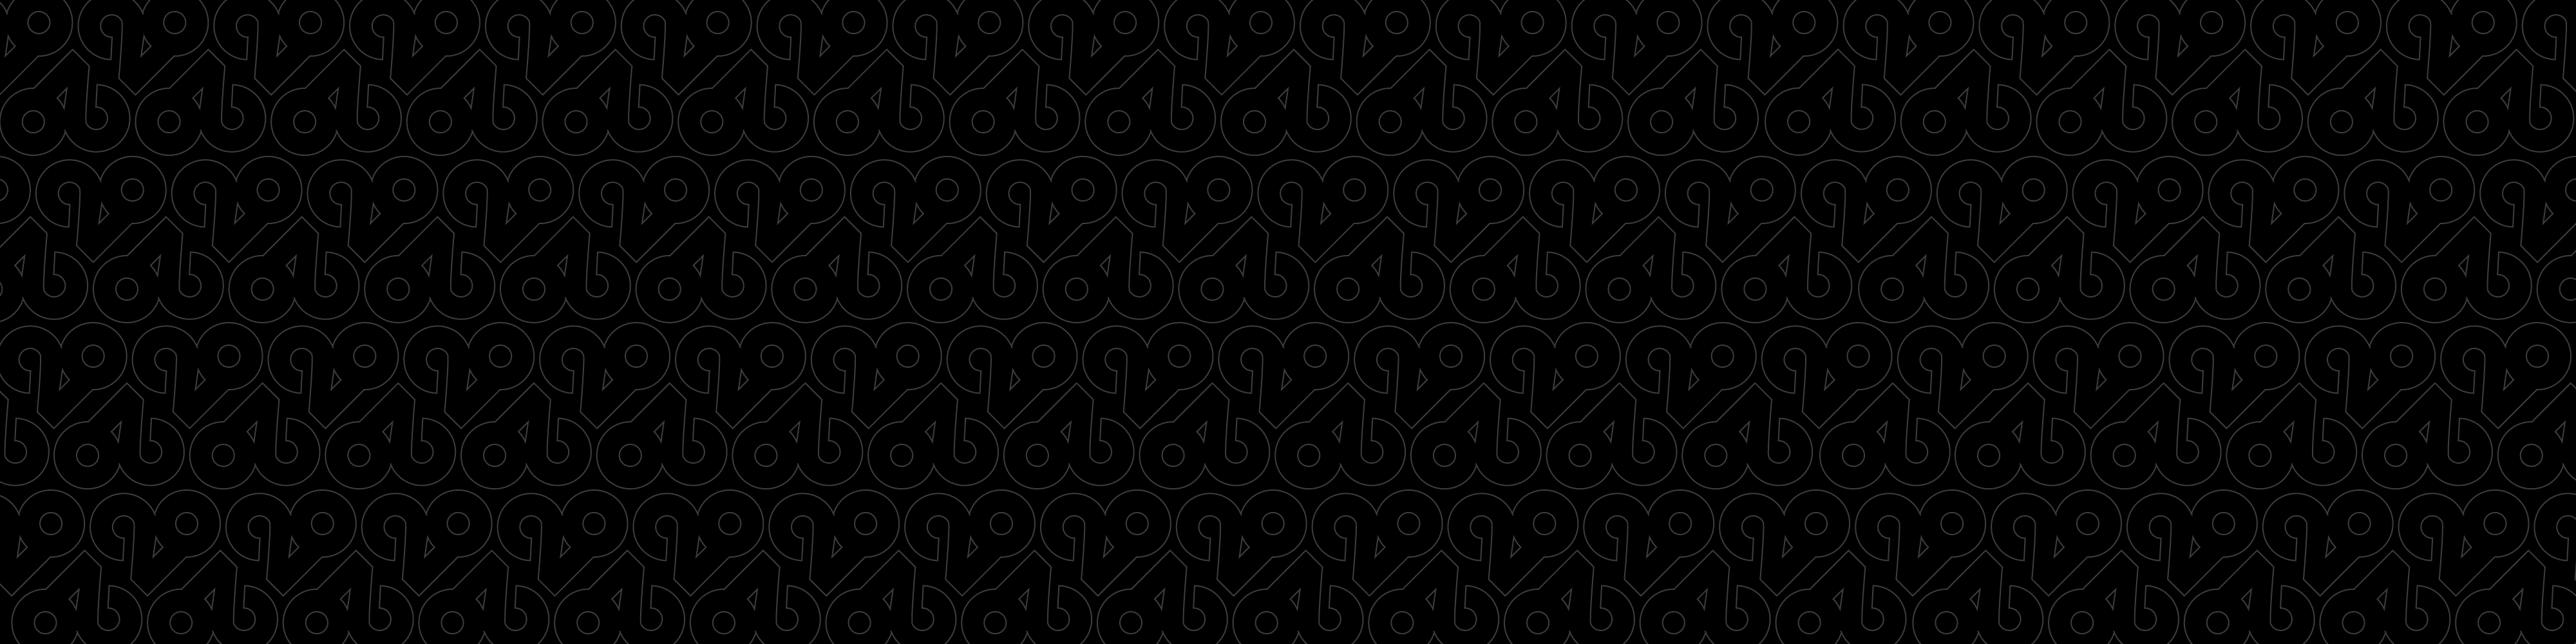 20 Pattern